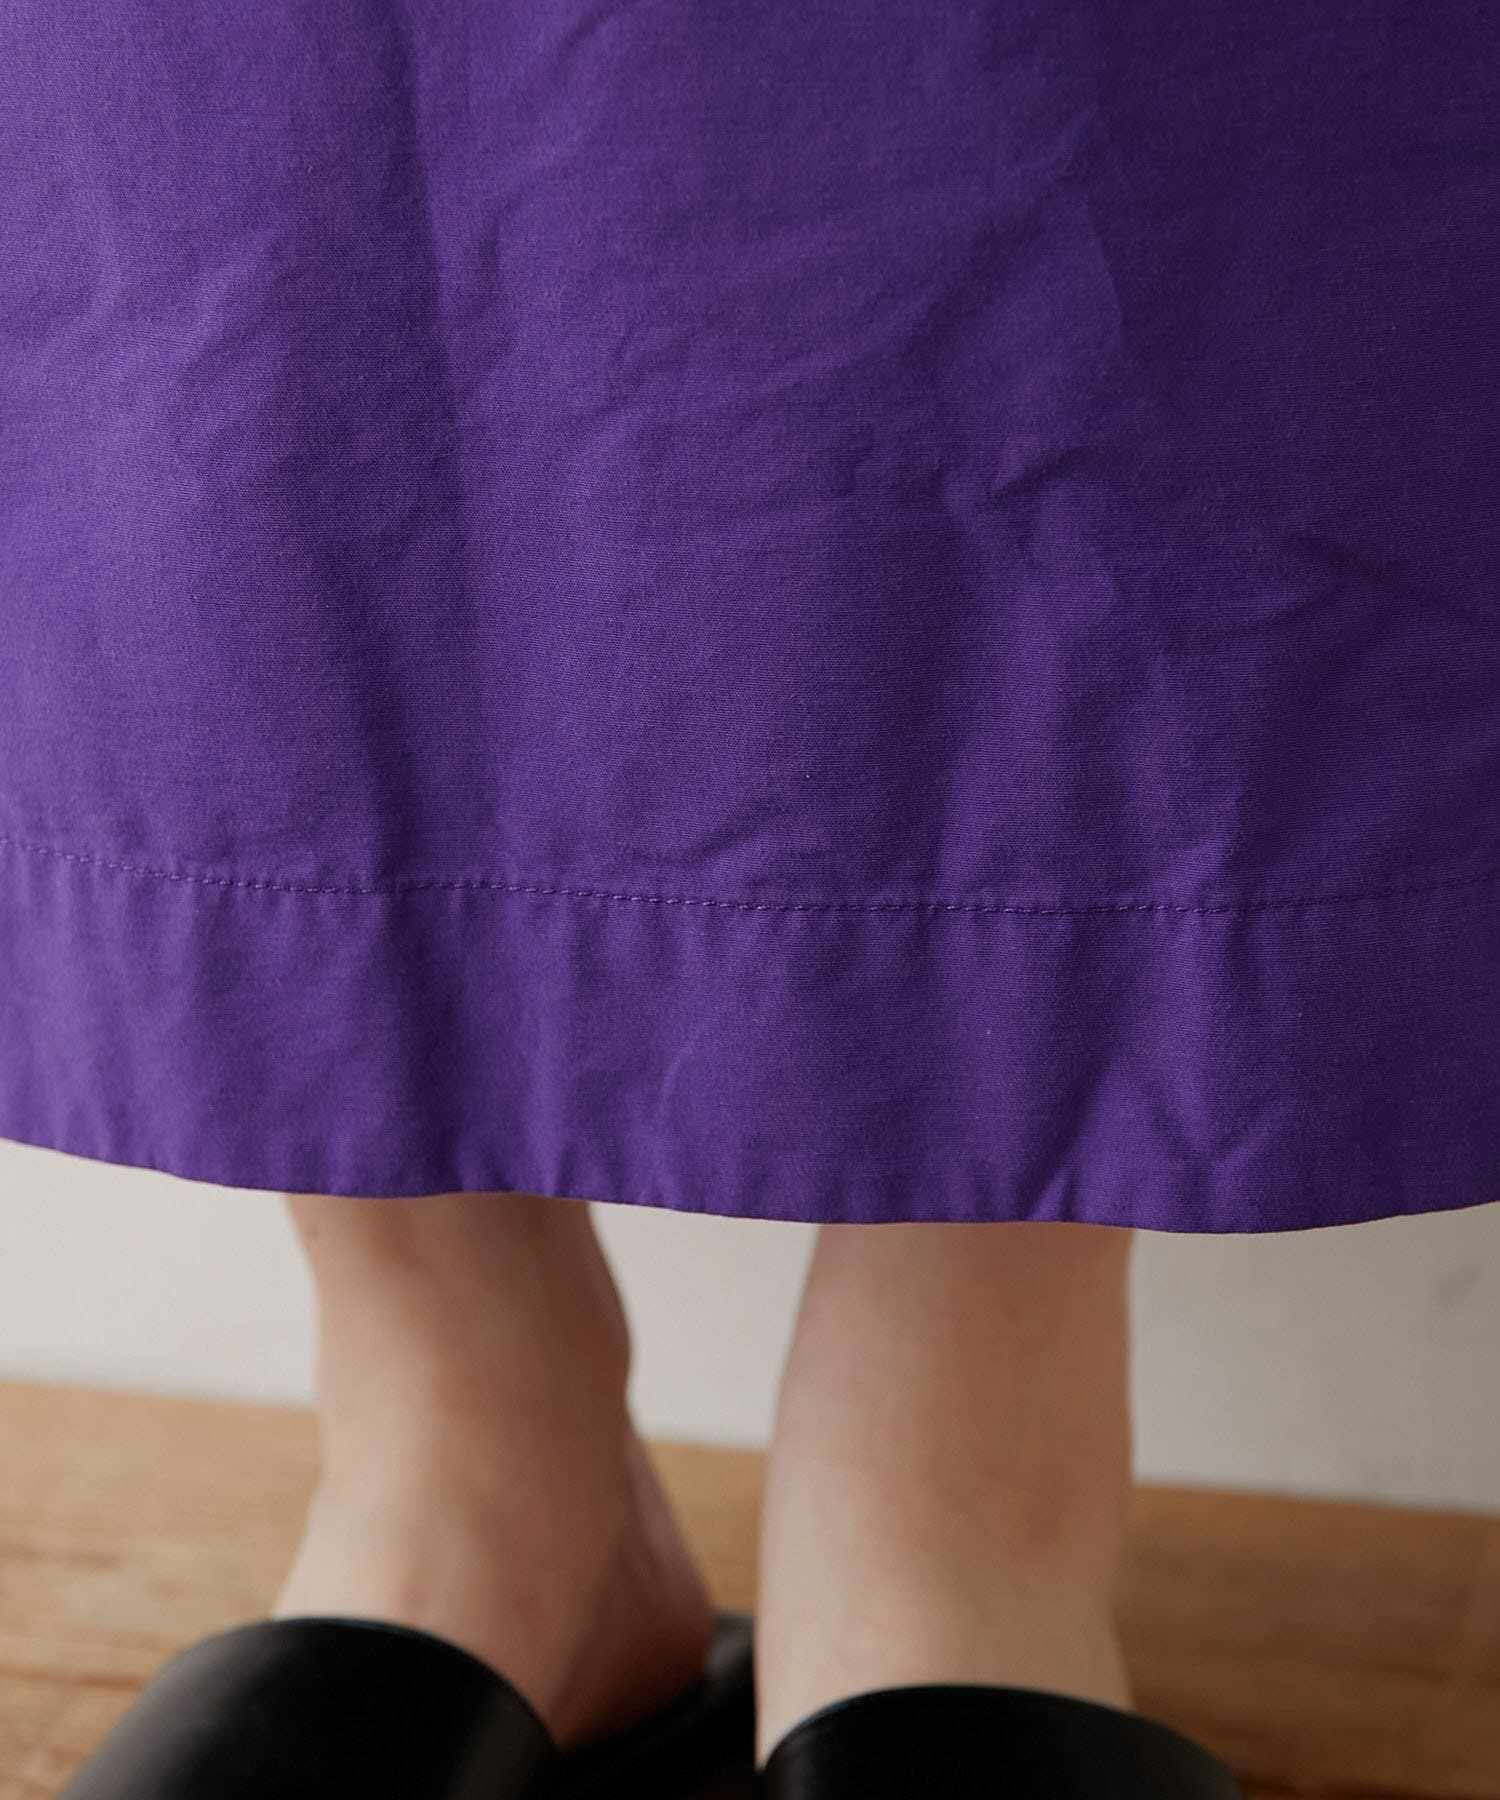 OUTLET(アウトレット) 【CIAOPANIC TYPY】綿ナイロンアウトポケットIラインスカート